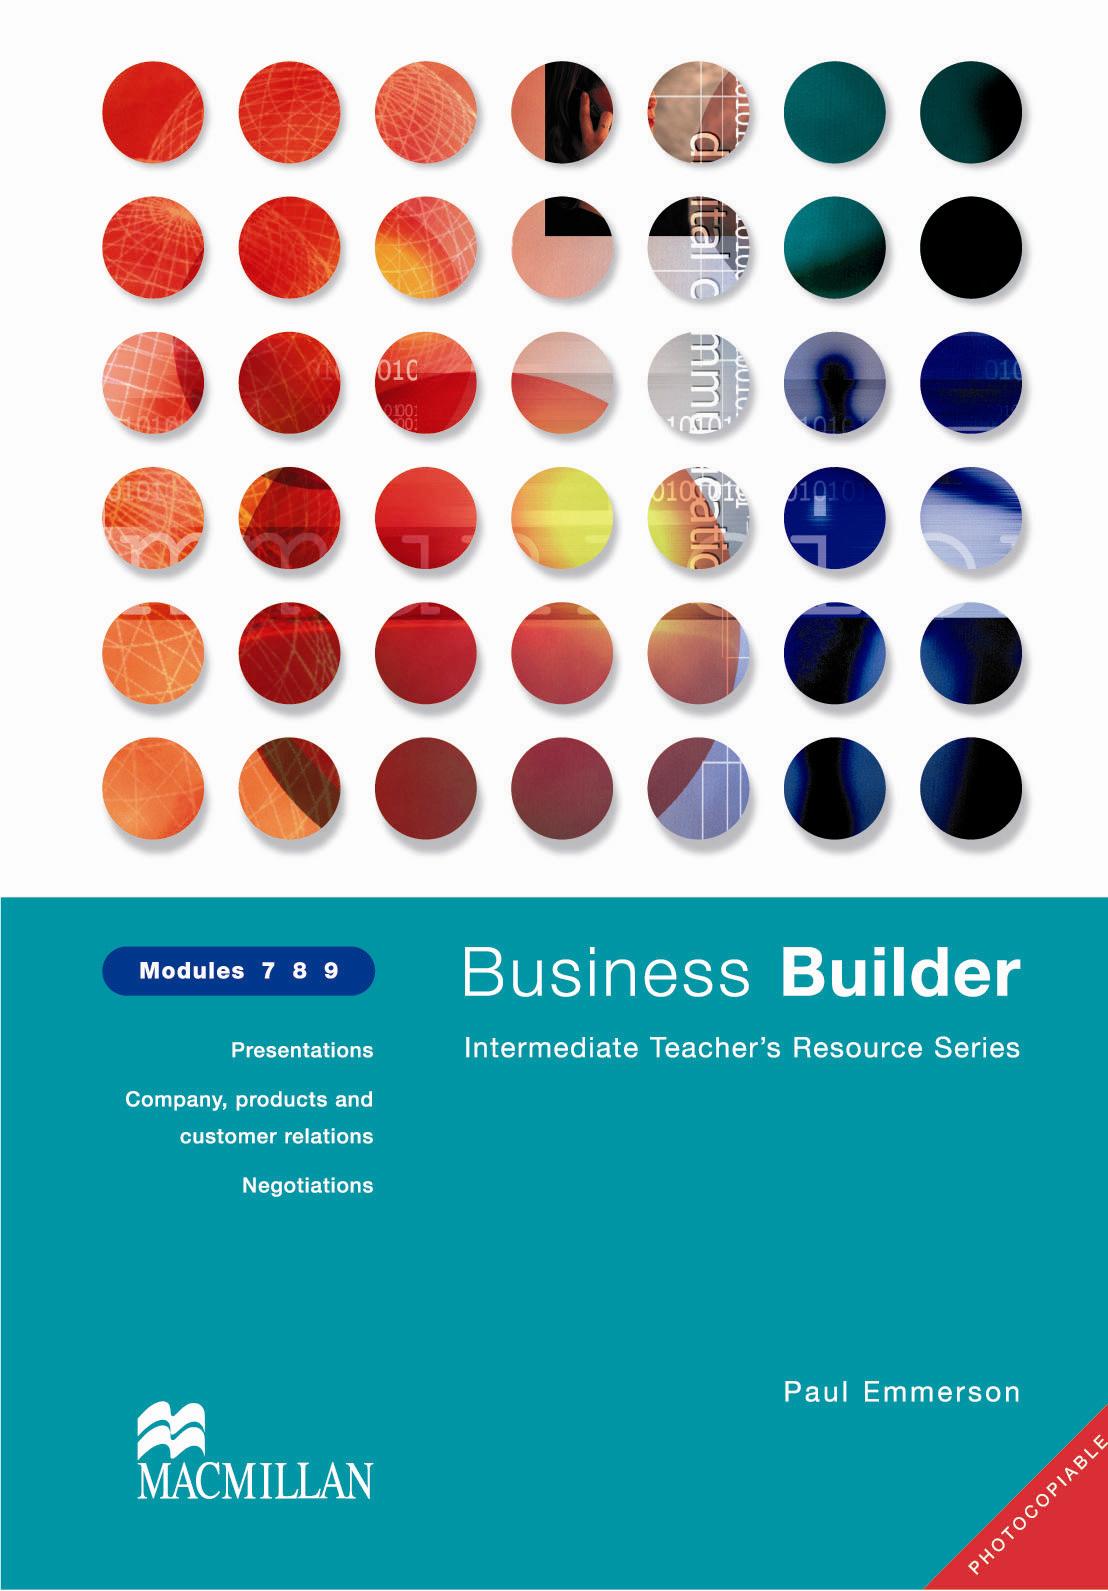 Business Builder Modules 7 - 9